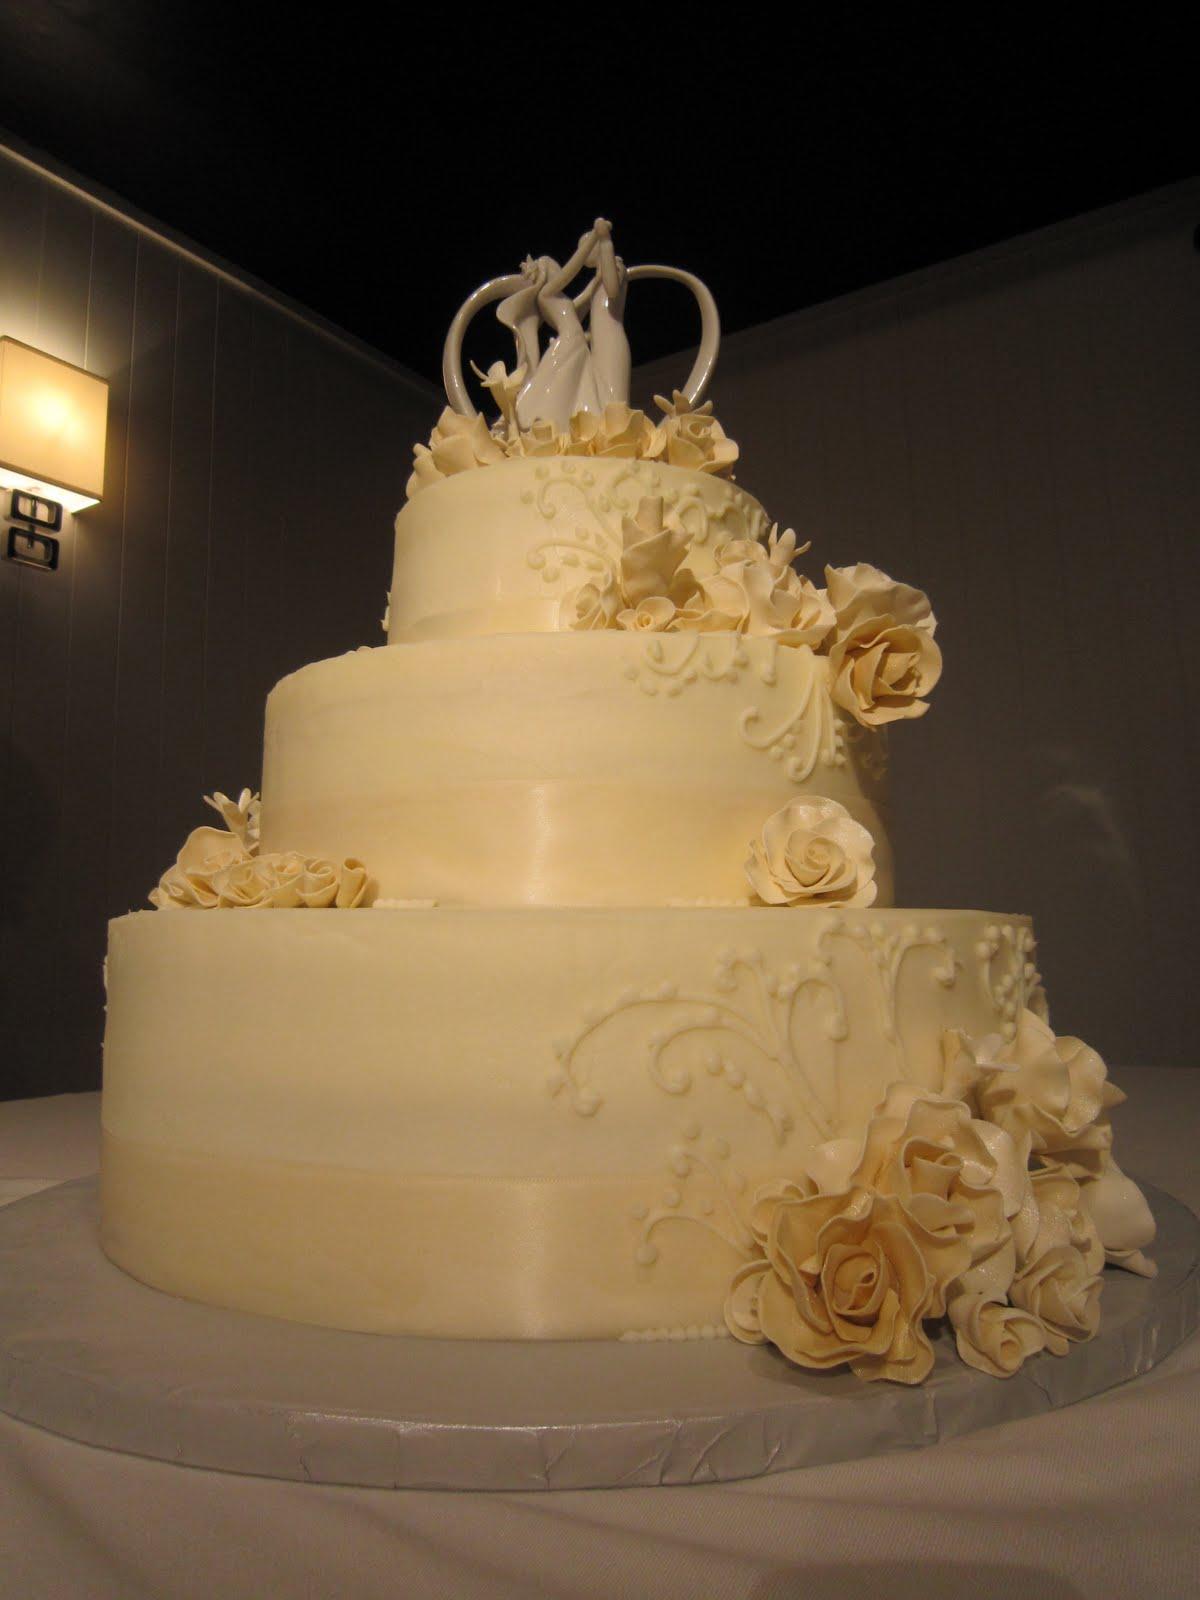 ellen 39 s cakes classic wedding cake. Black Bedroom Furniture Sets. Home Design Ideas